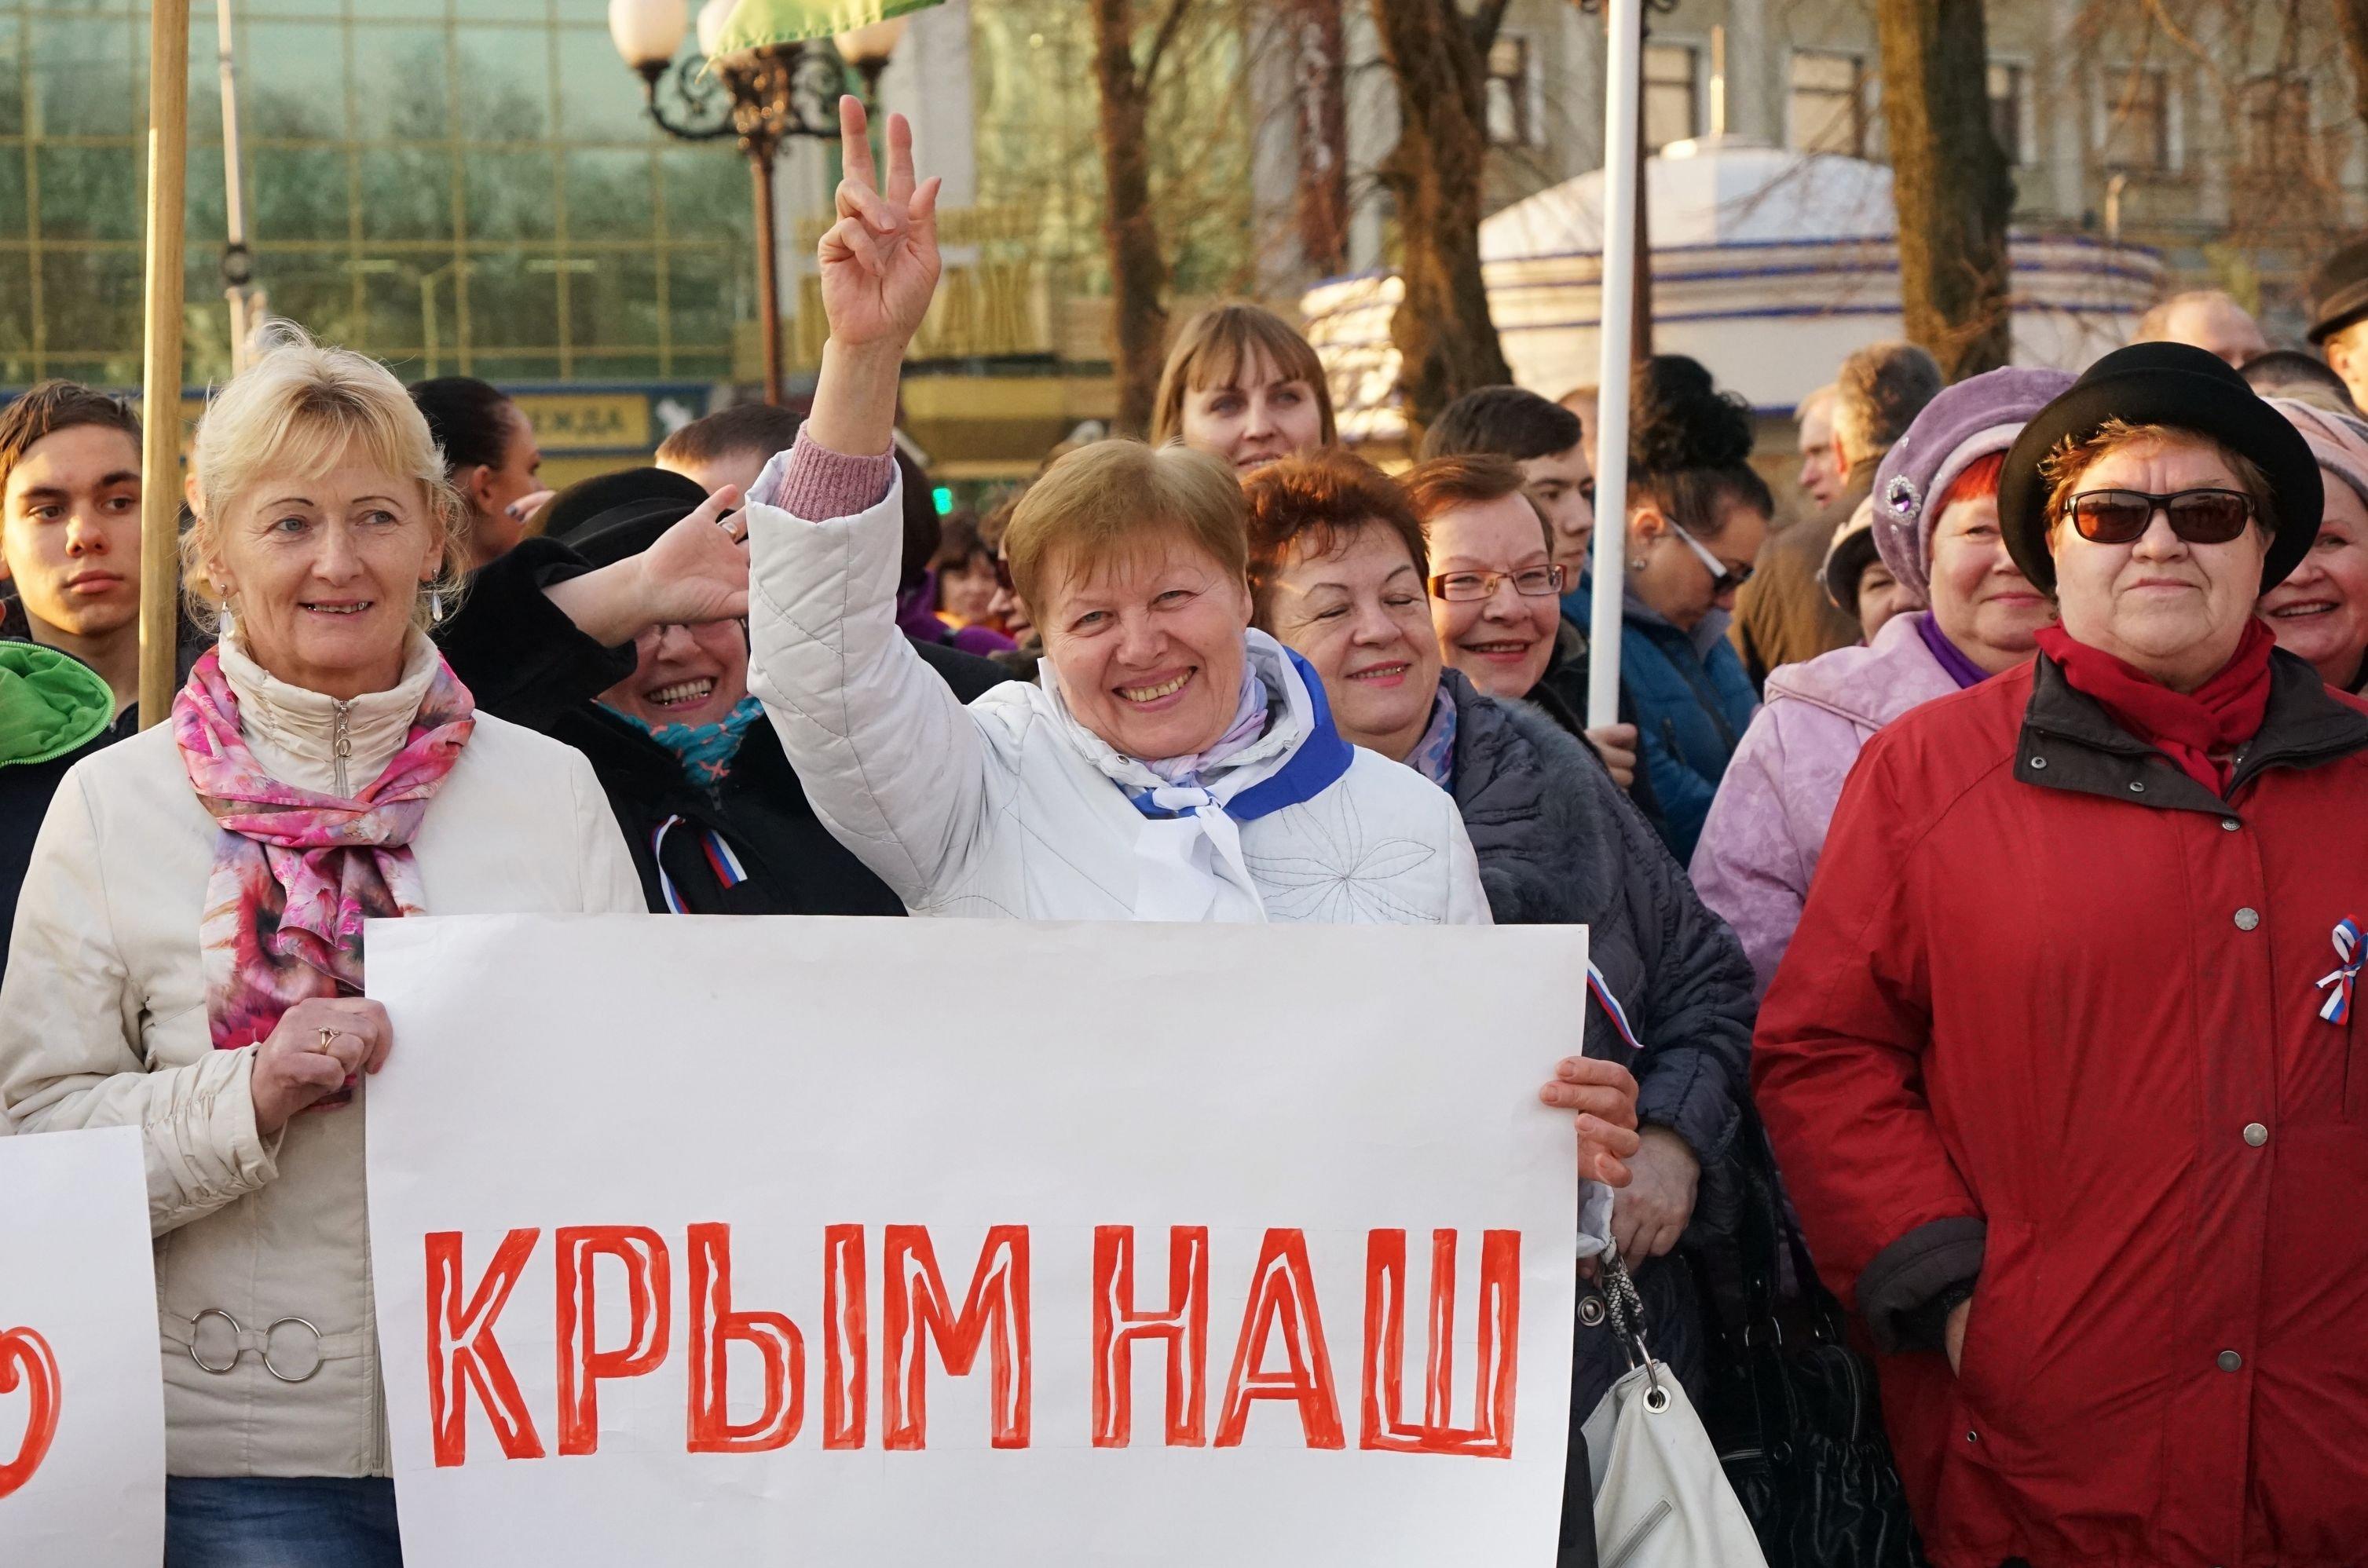 Крым наш прикольные картинки, бабушке днем